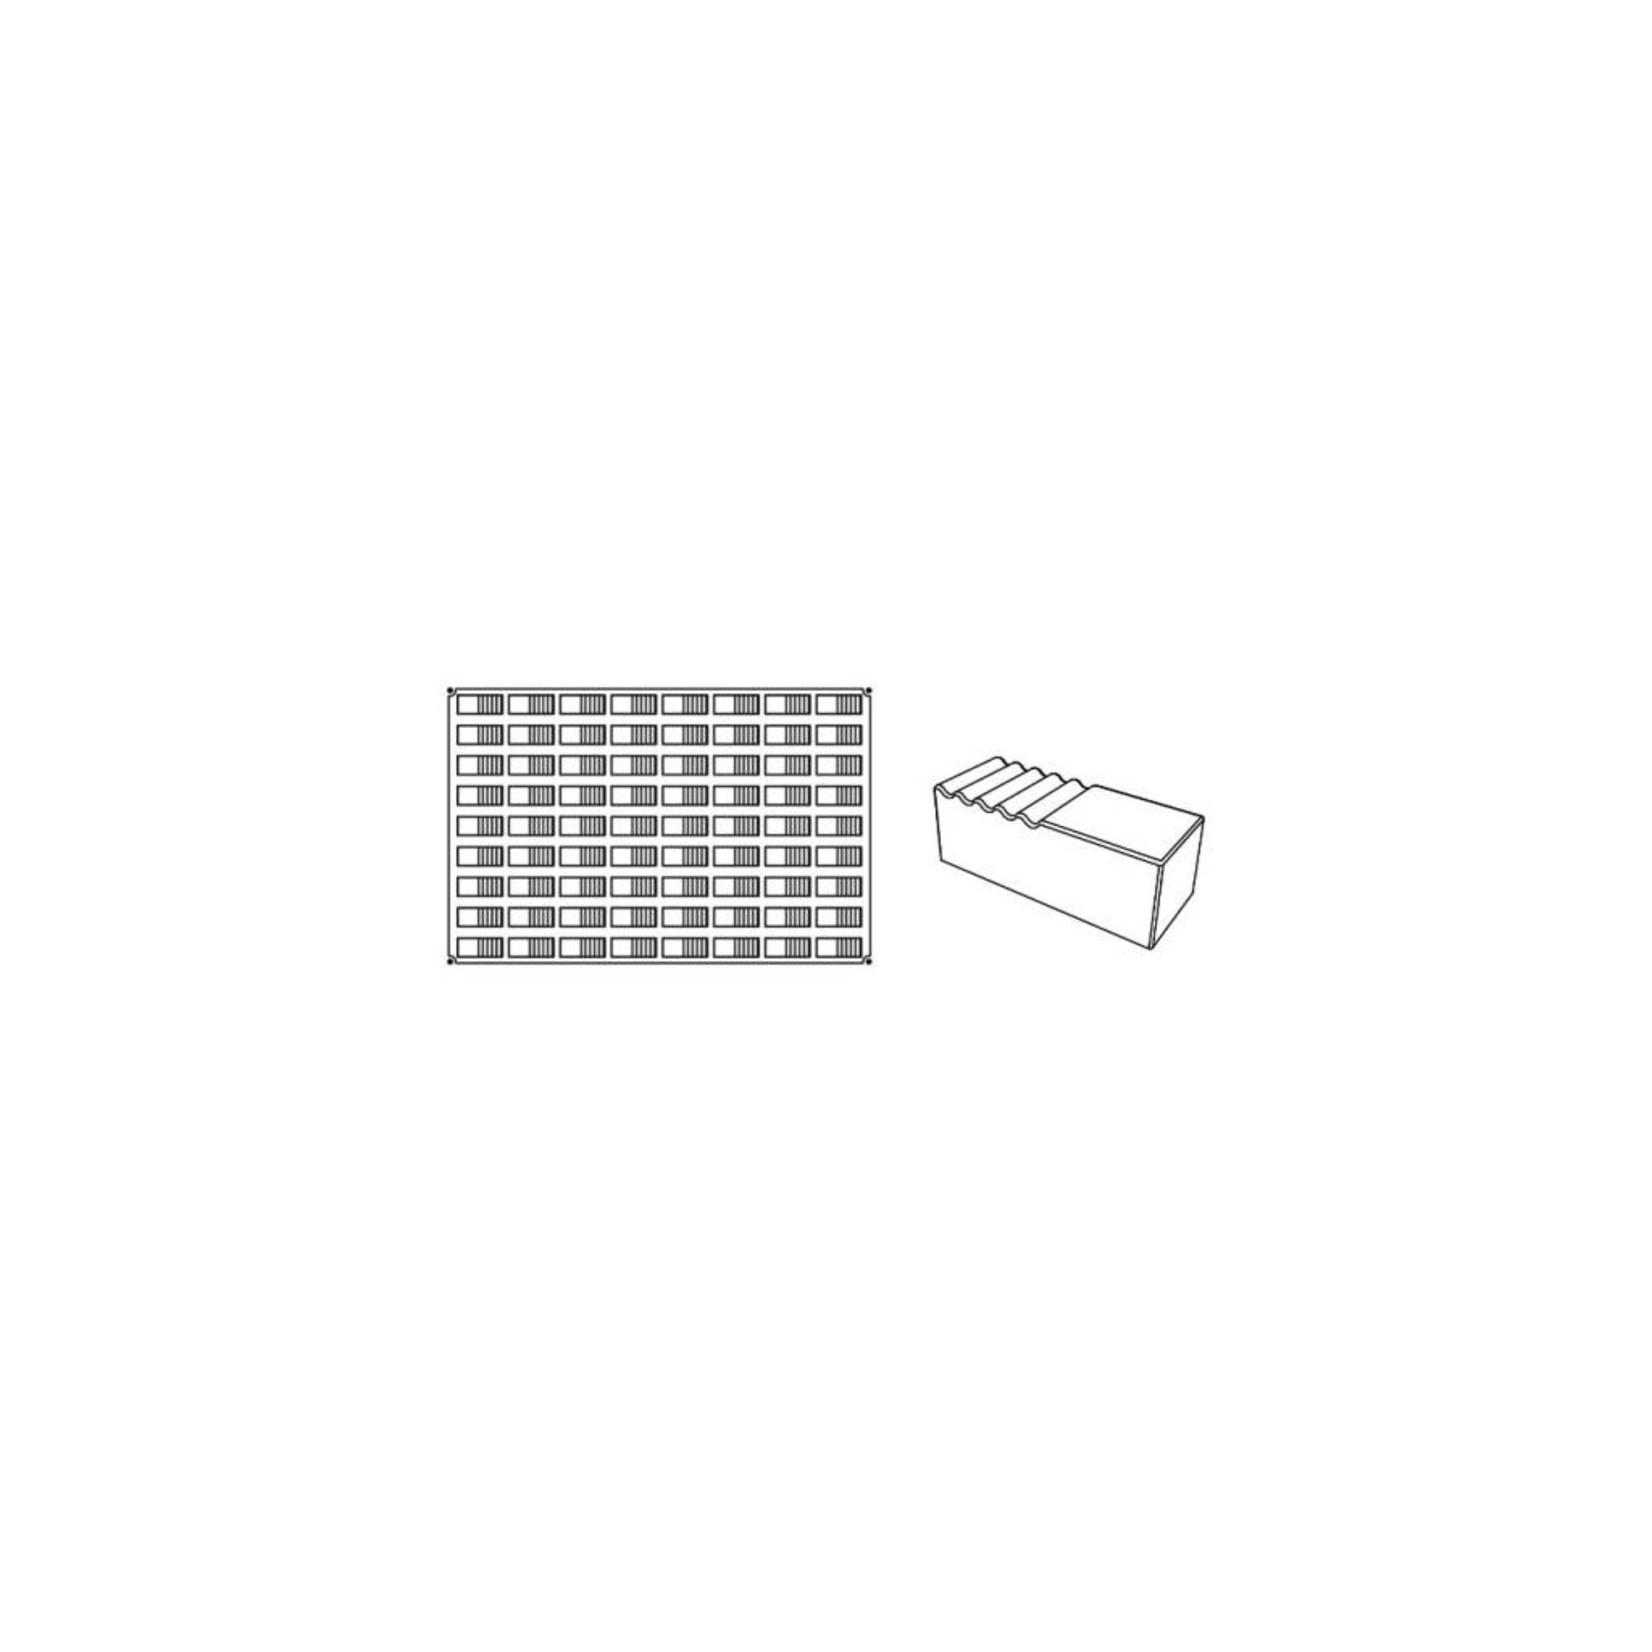 Pavoni Pavoni - Pavoflex silicone mold, Log, Mignon (72 cavity), PX043